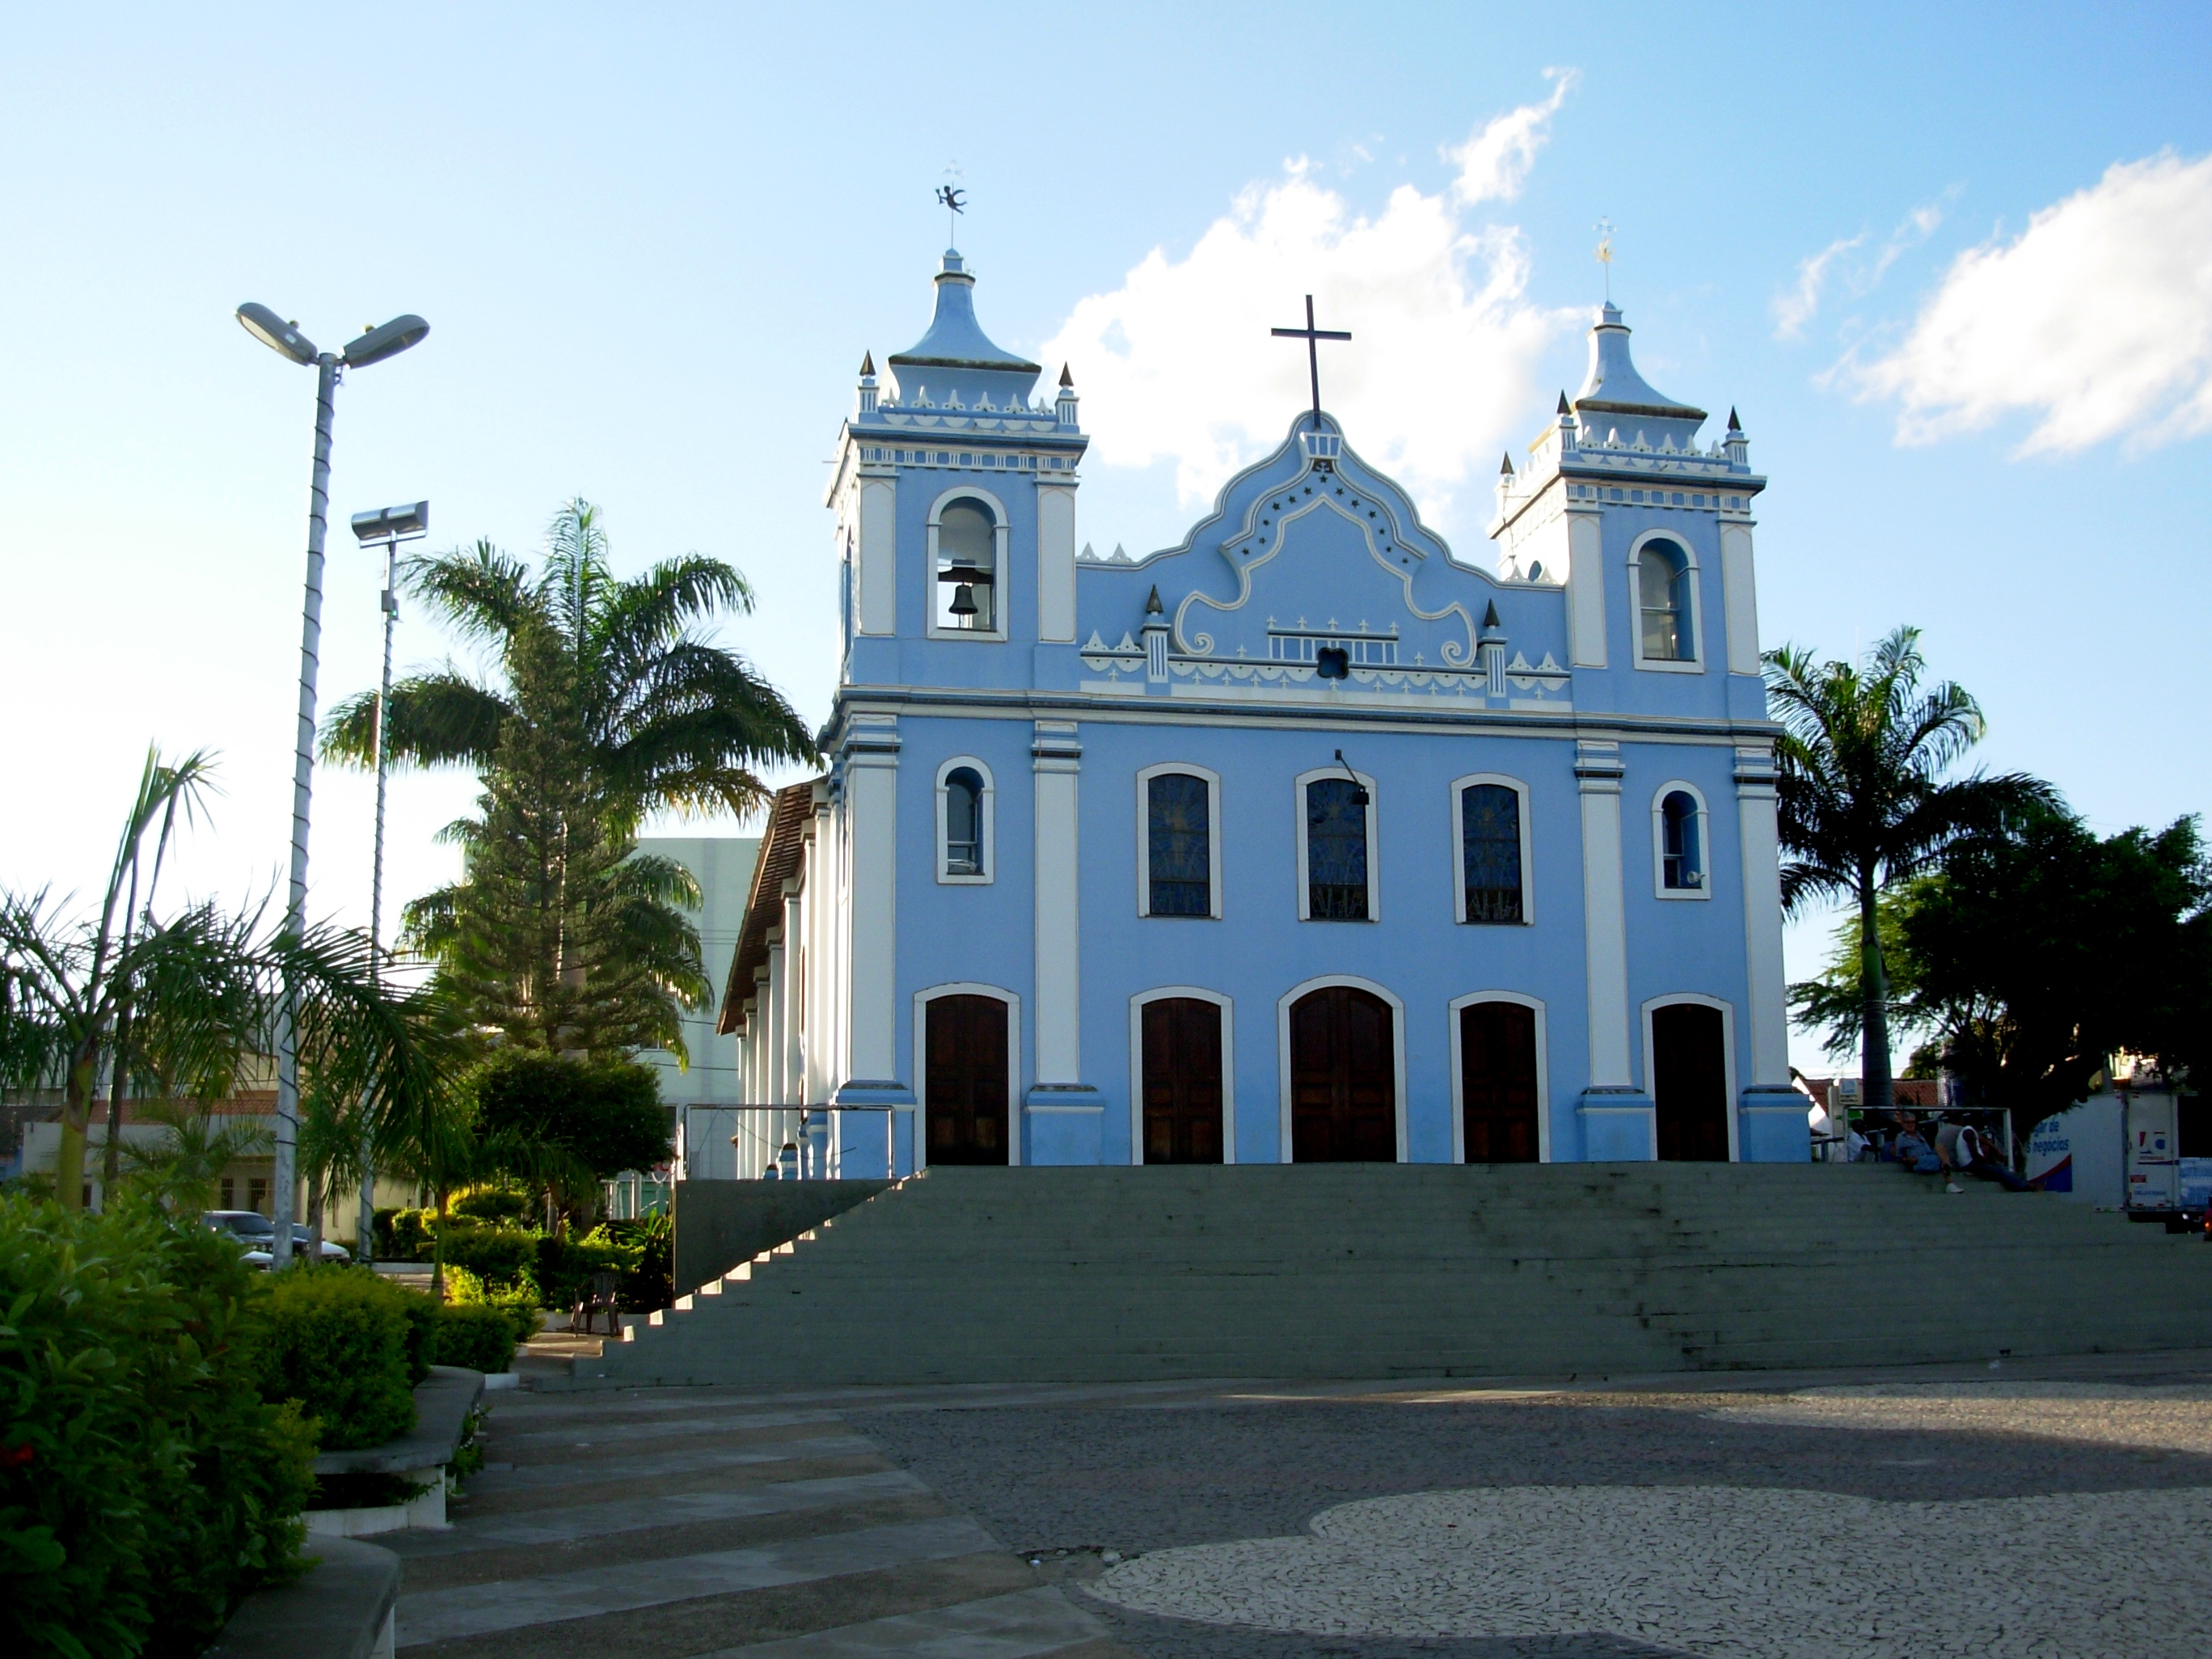 Brumado Bahia fonte: upload.wikimedia.org